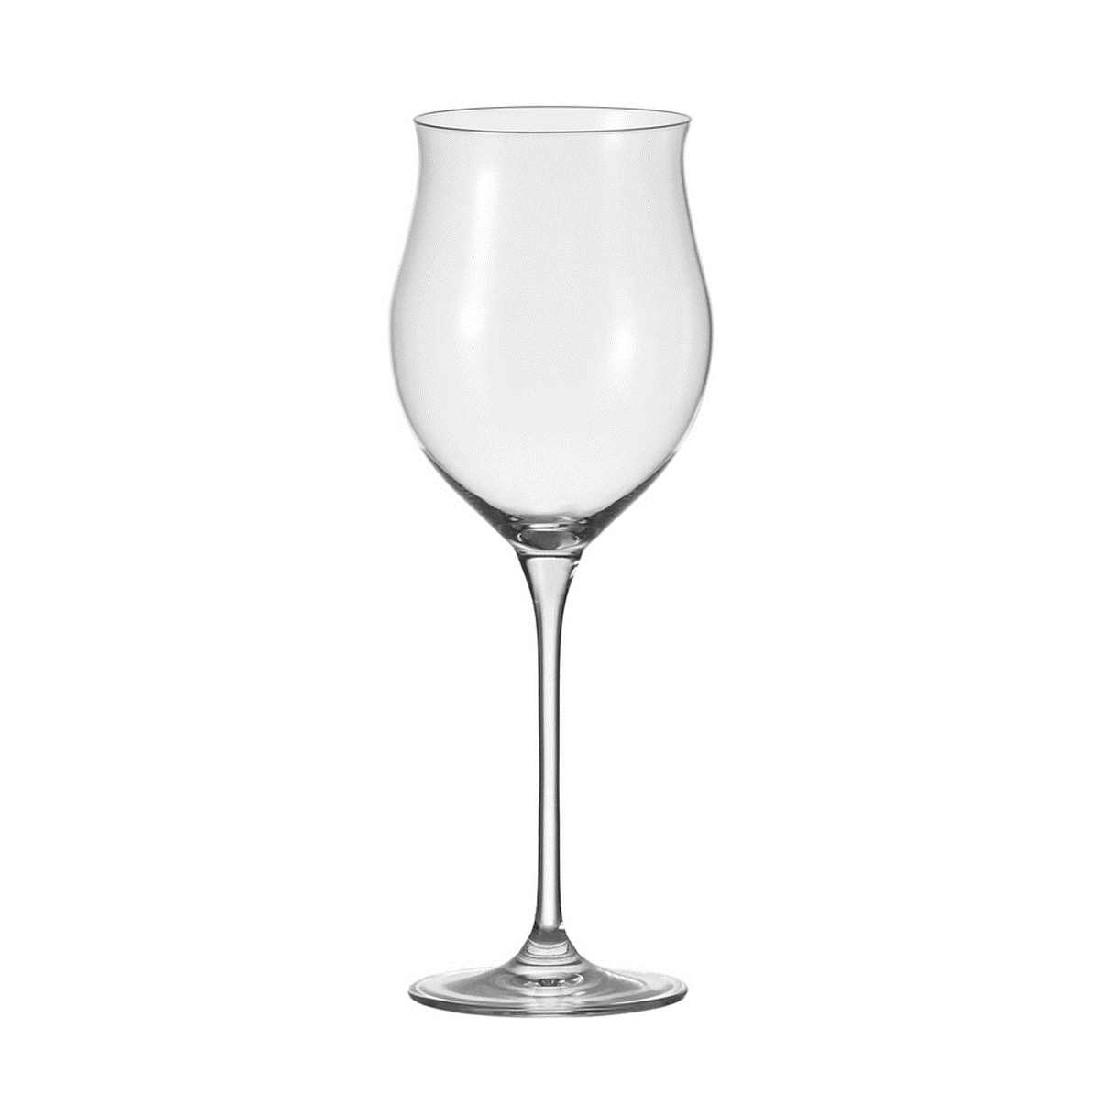 Bordeauxglas Cheers (6er-Set), Leonardo kaufen